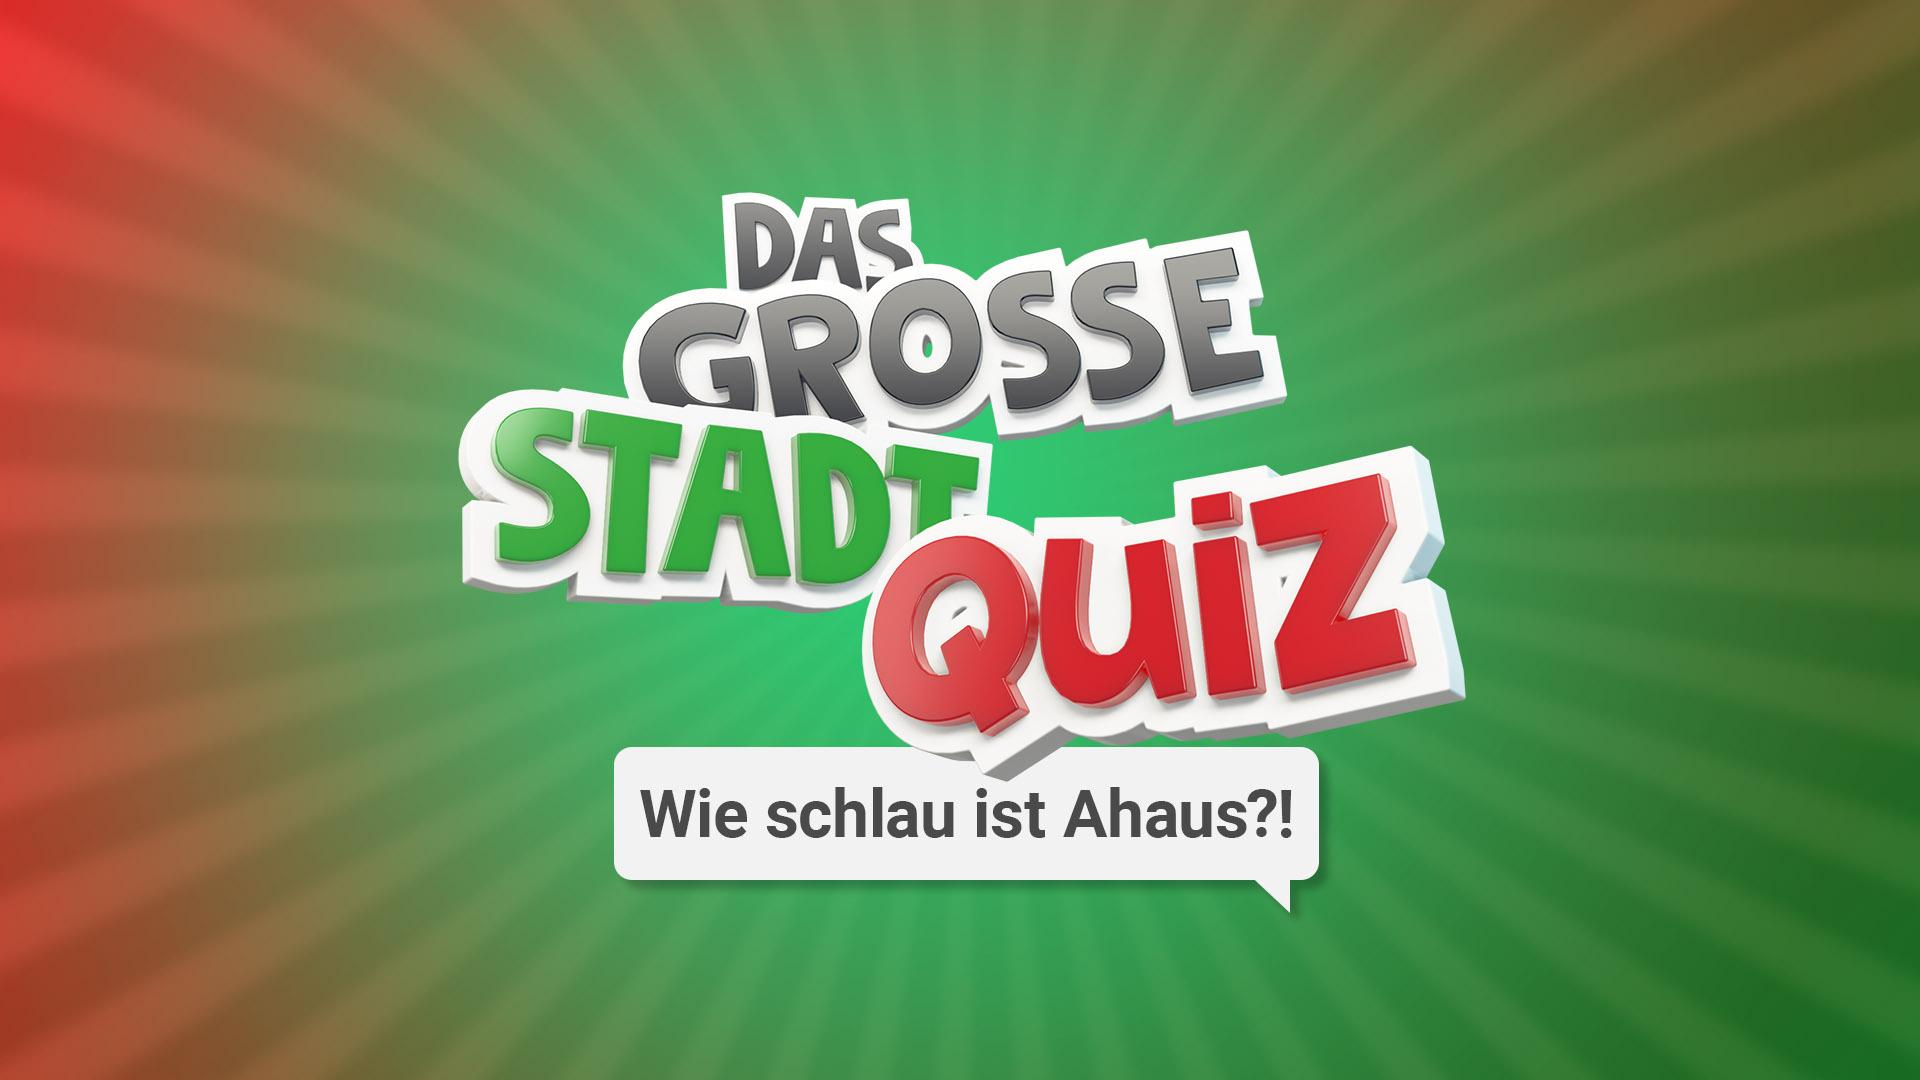 Stadtquiz Ahaus 1_Tobit.Software_Ahaus Marketing & Touristik GmbH